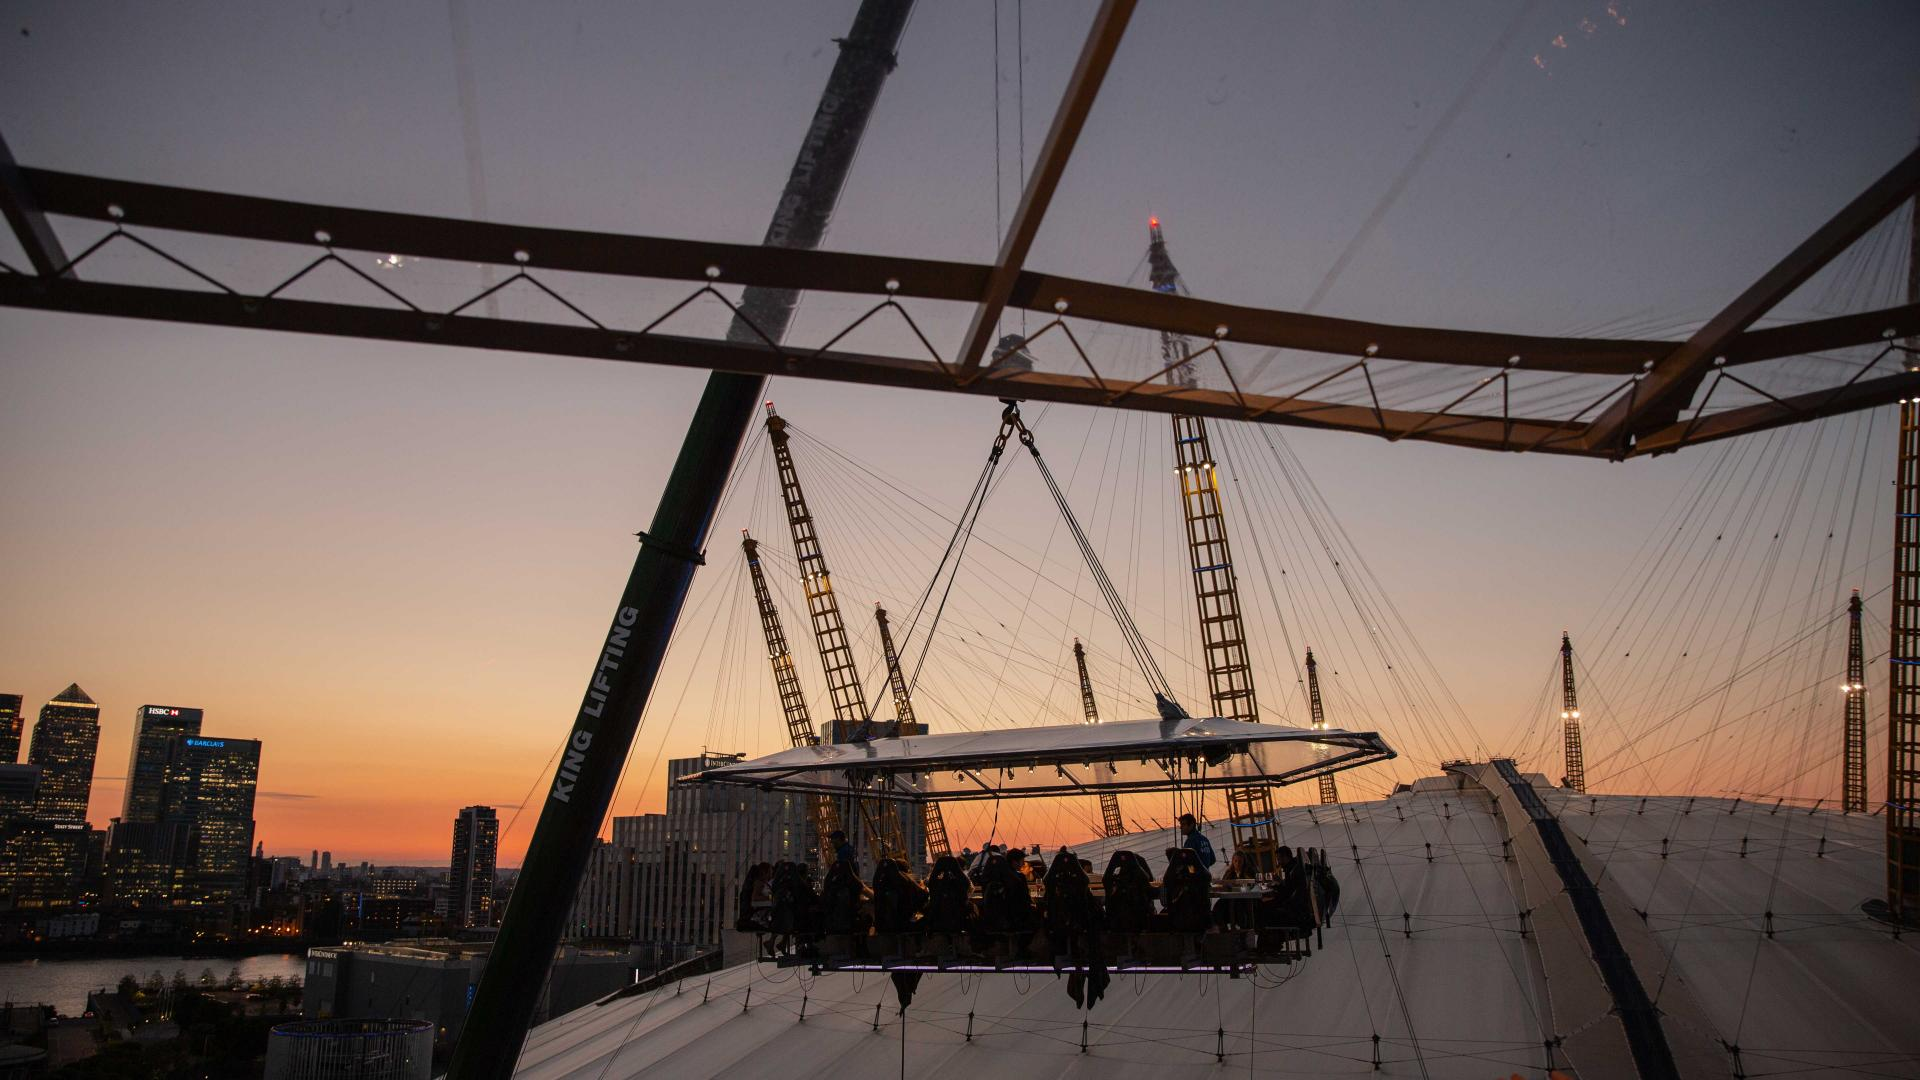 Summer in London 2021: London In The Sky